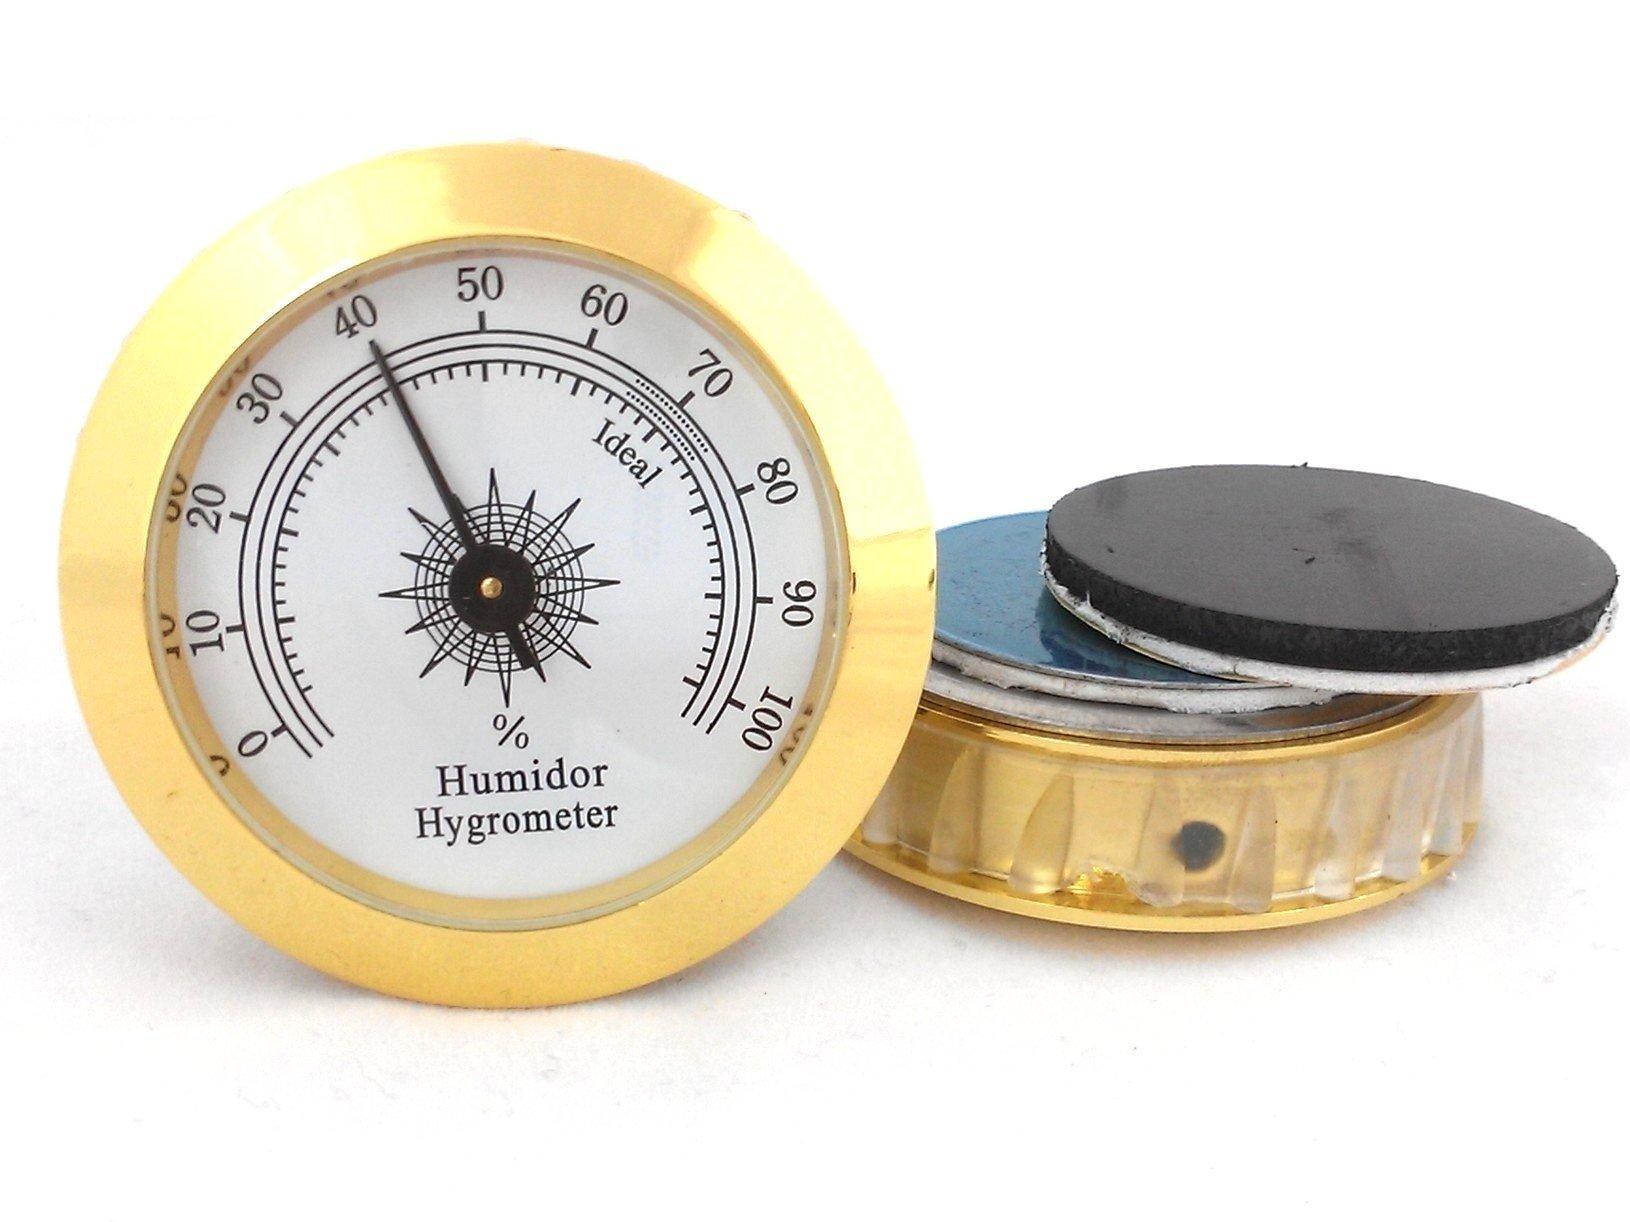 CiGuru CH001 Adjustable Cigar Analog Hygrometer 2'' - 1 unit